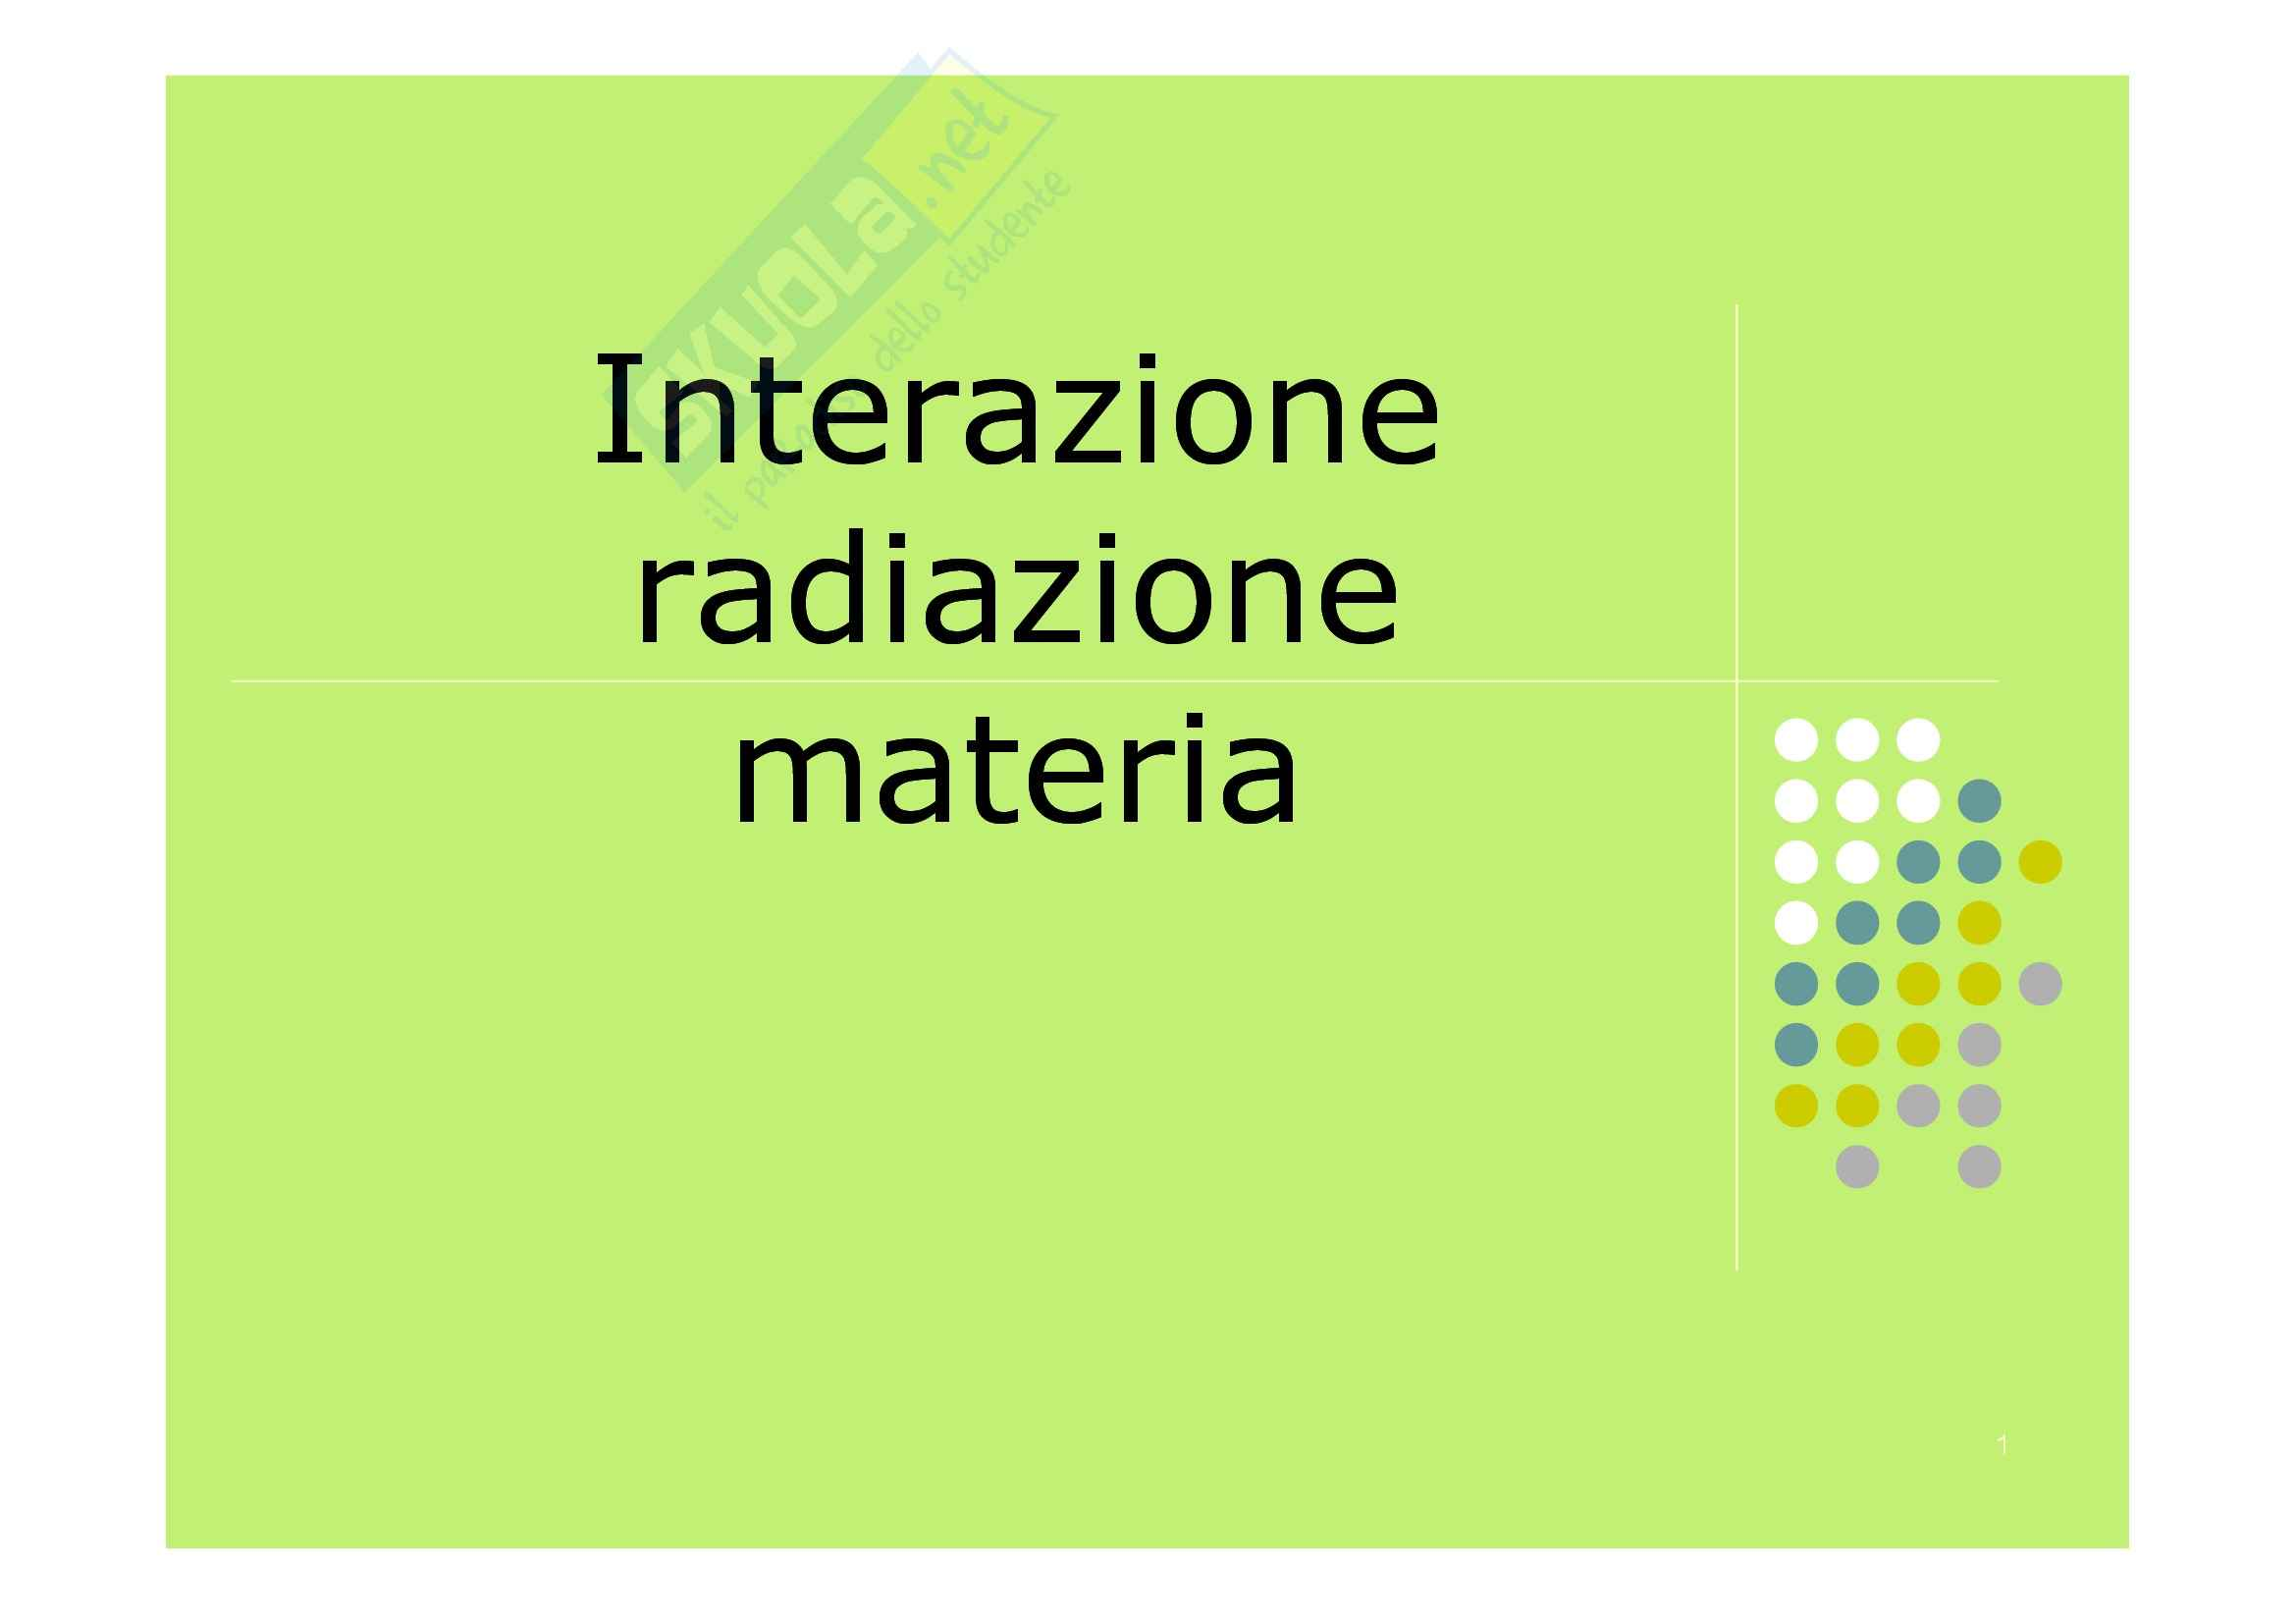 Interazione, radiazione, materia